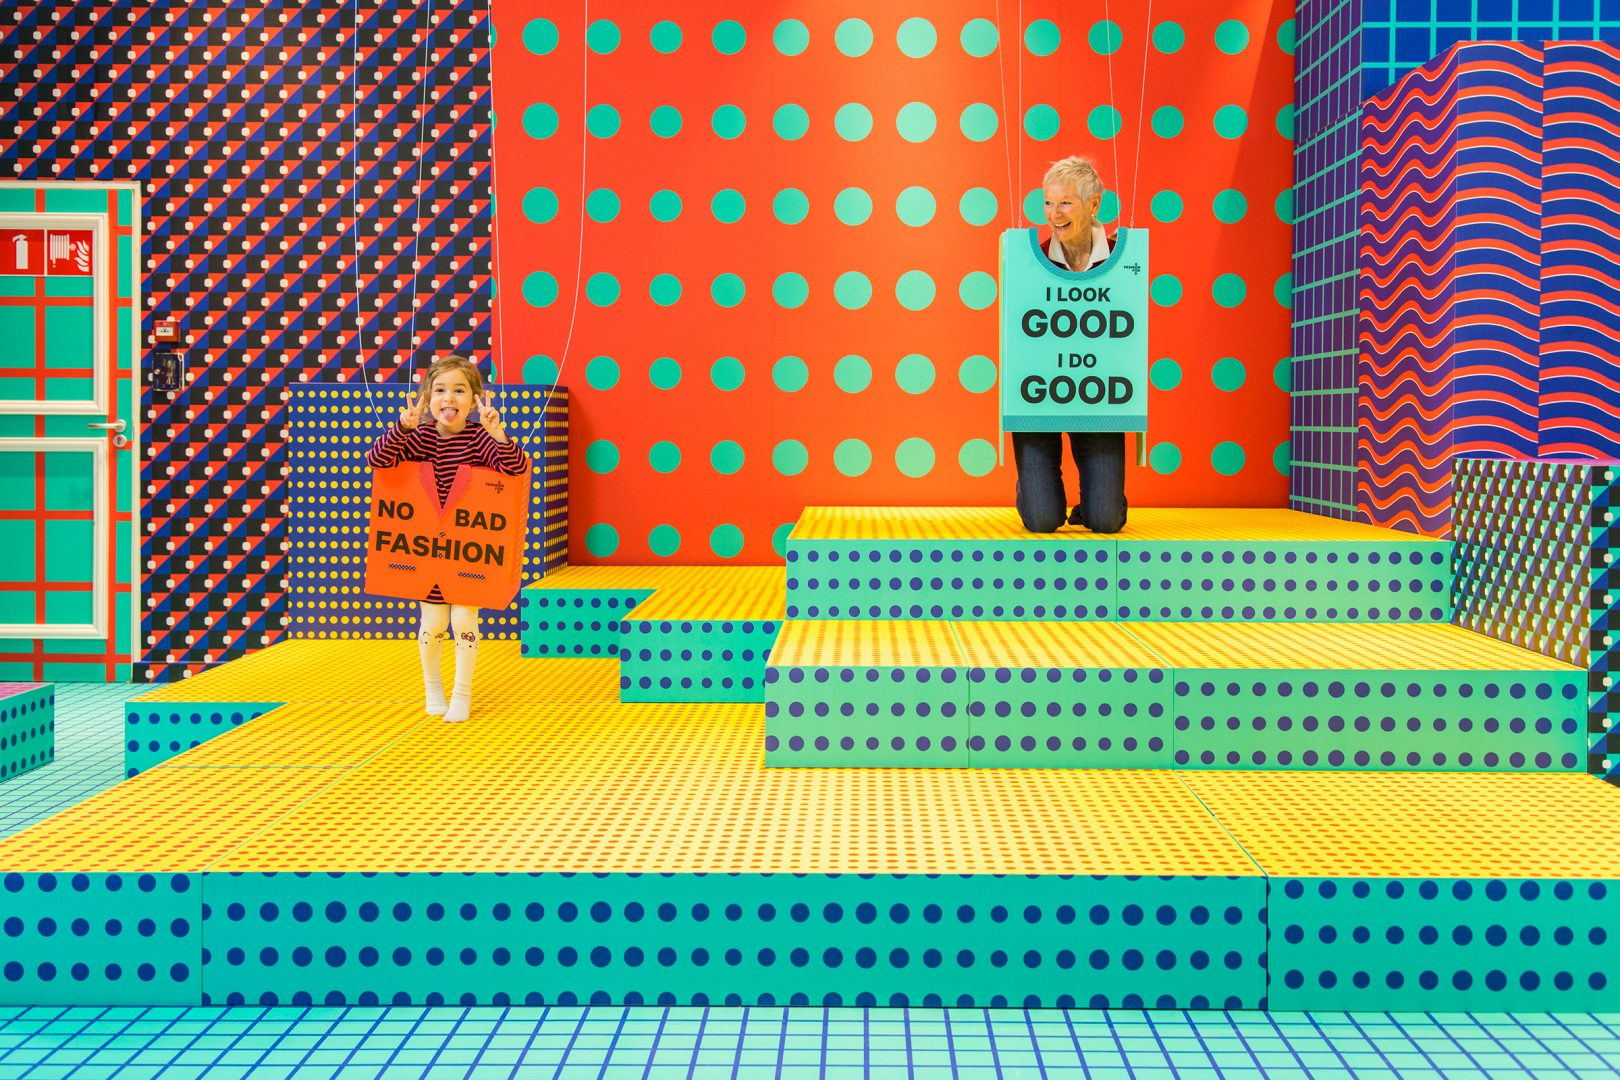 Generation t beyond fashion projects Cheery Lynn Designs Inspiration Blog